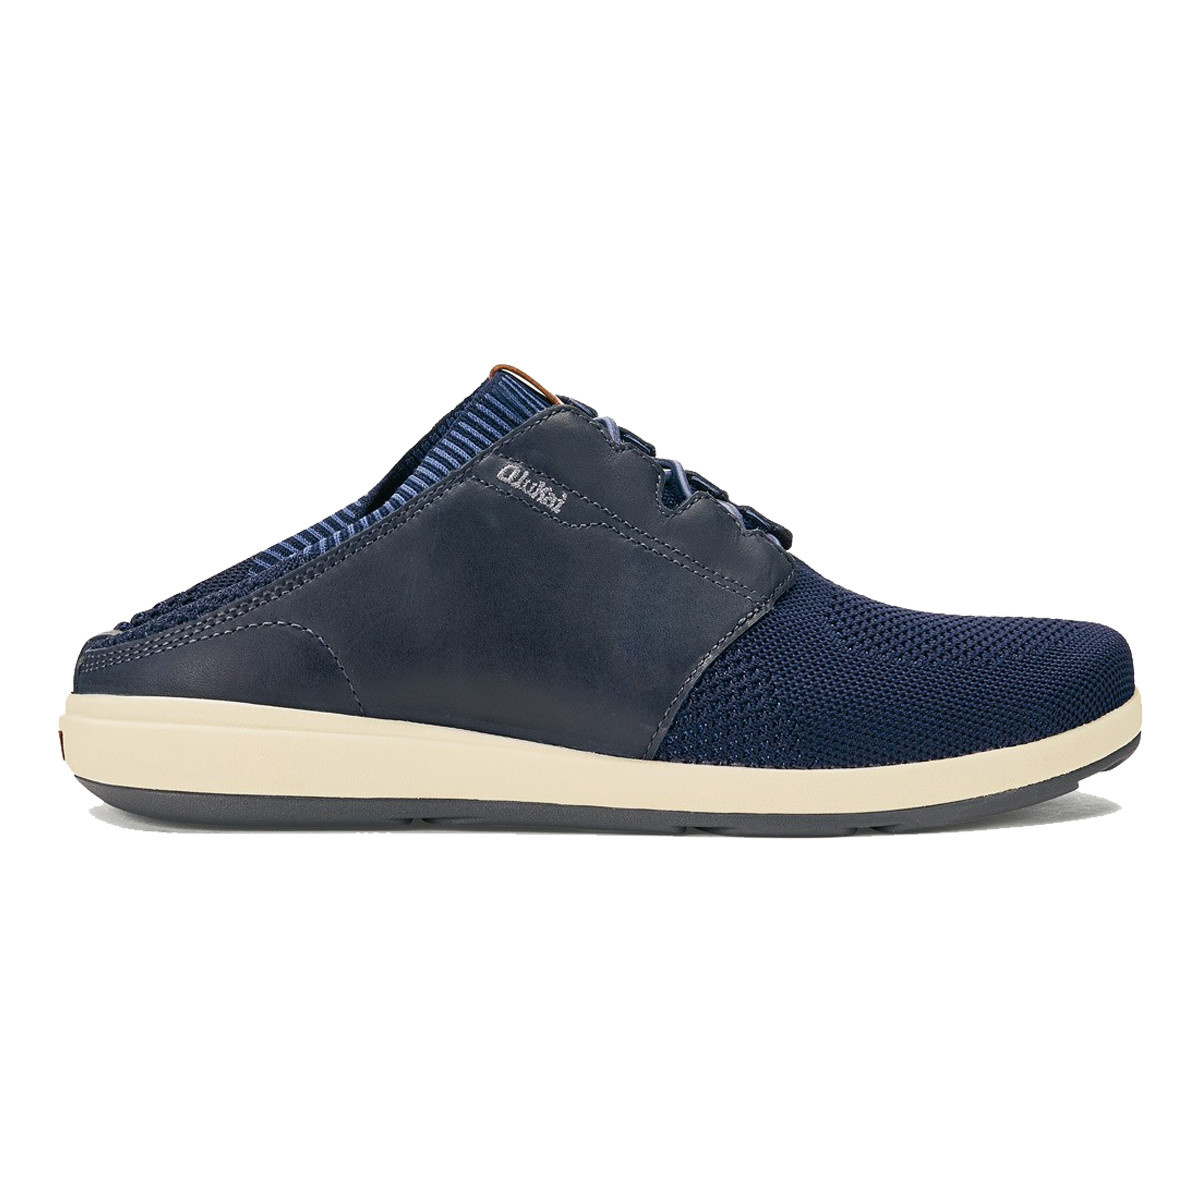 OluKai OluKai Men's Makia Ulana Sneaker Trench Blue